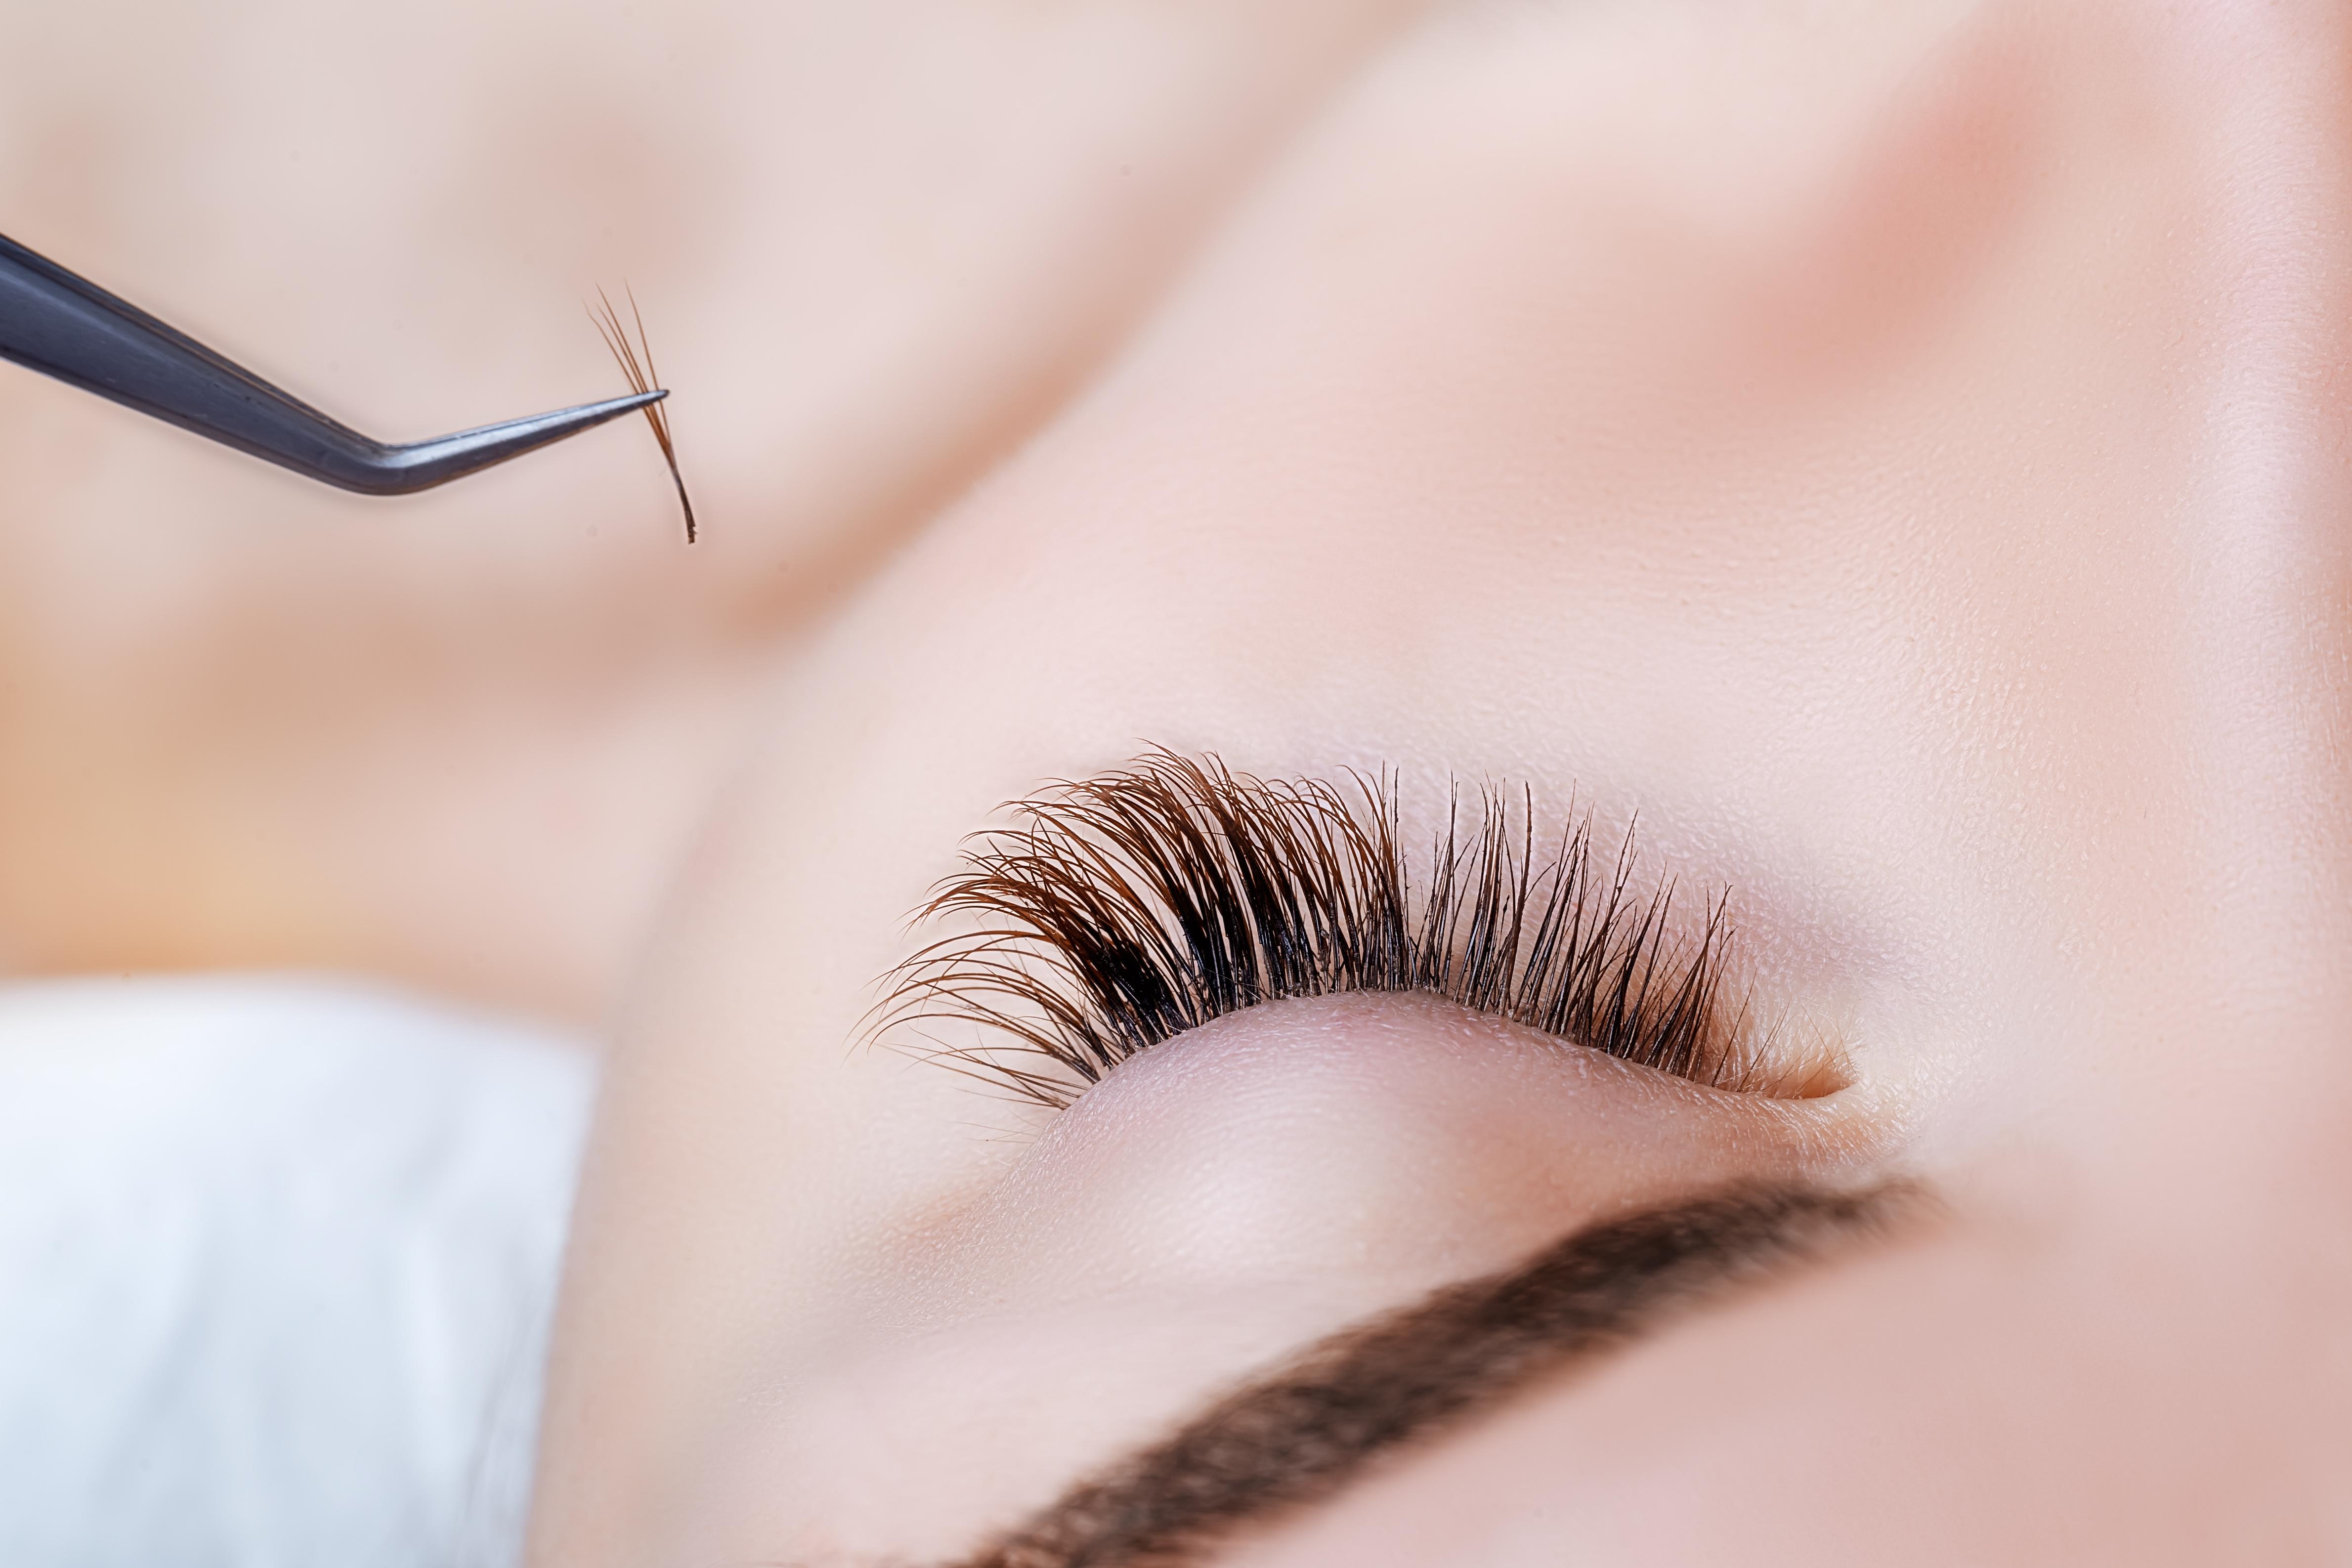 https://0901.nccdn.net/4_2/000/000/017/e75/Canva---Woman-Eye-with-Long-Eyelashes.-Eyelash-Extension.-Lashes--close-up---1--4759x3173.jpg